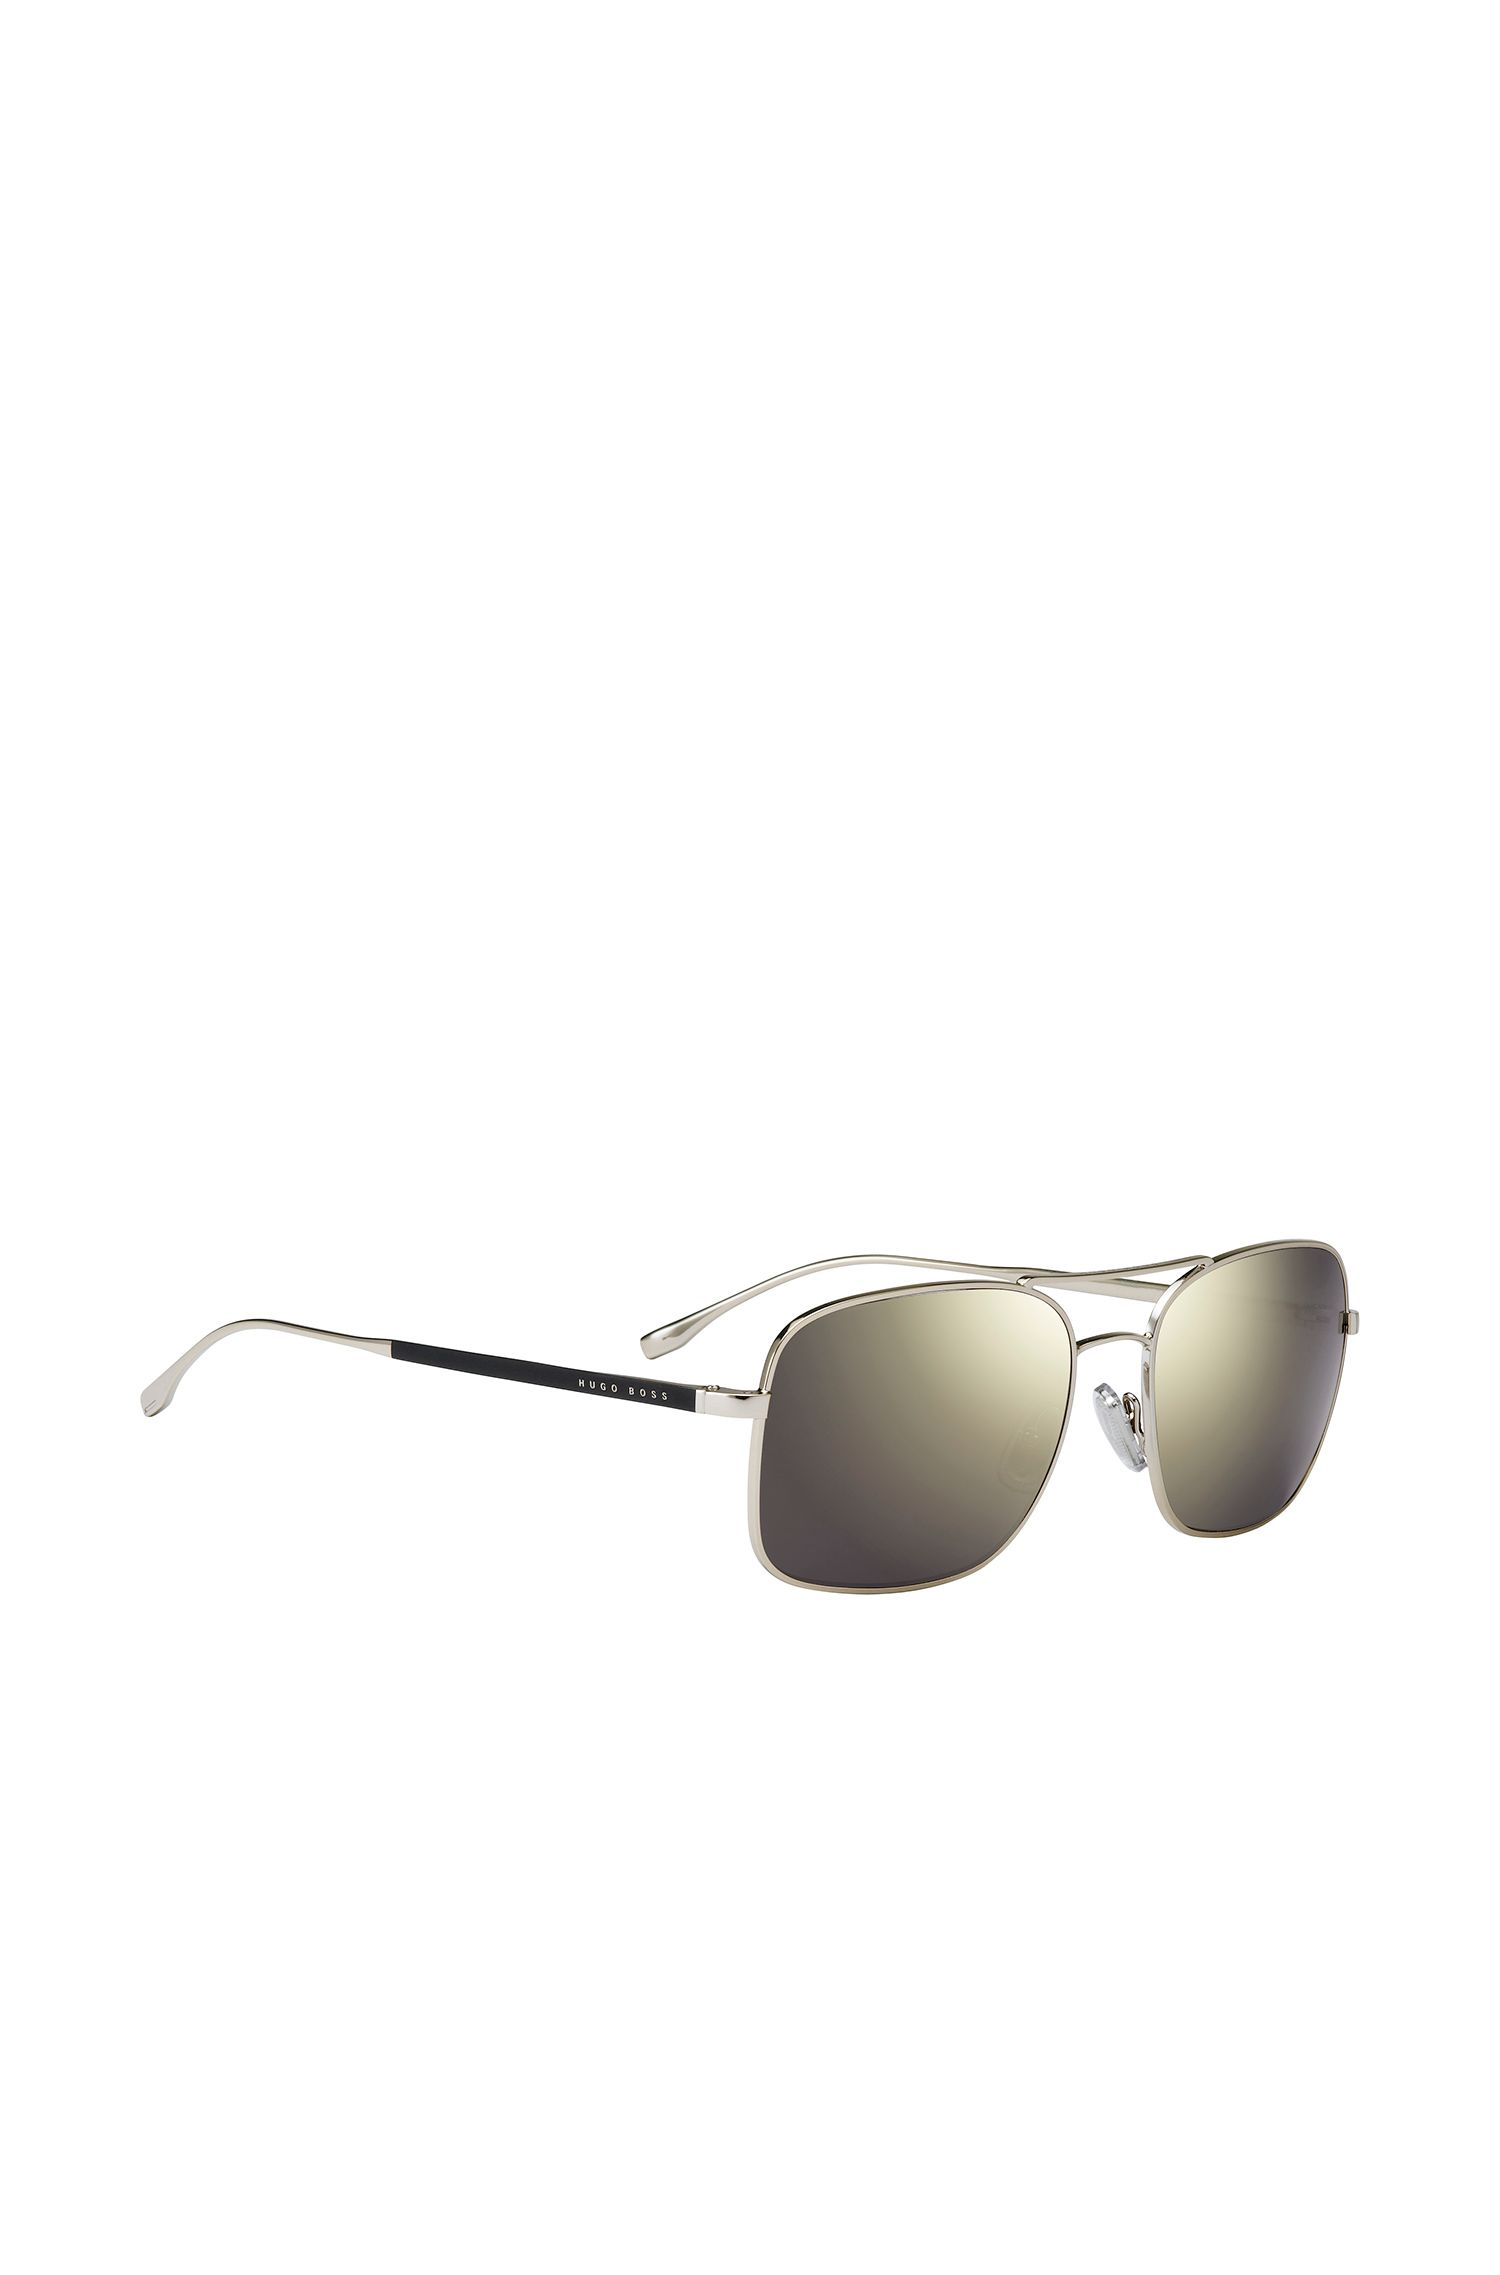 'BOSS 0781S' | Gunmetal Lens Caravan Sunglasses